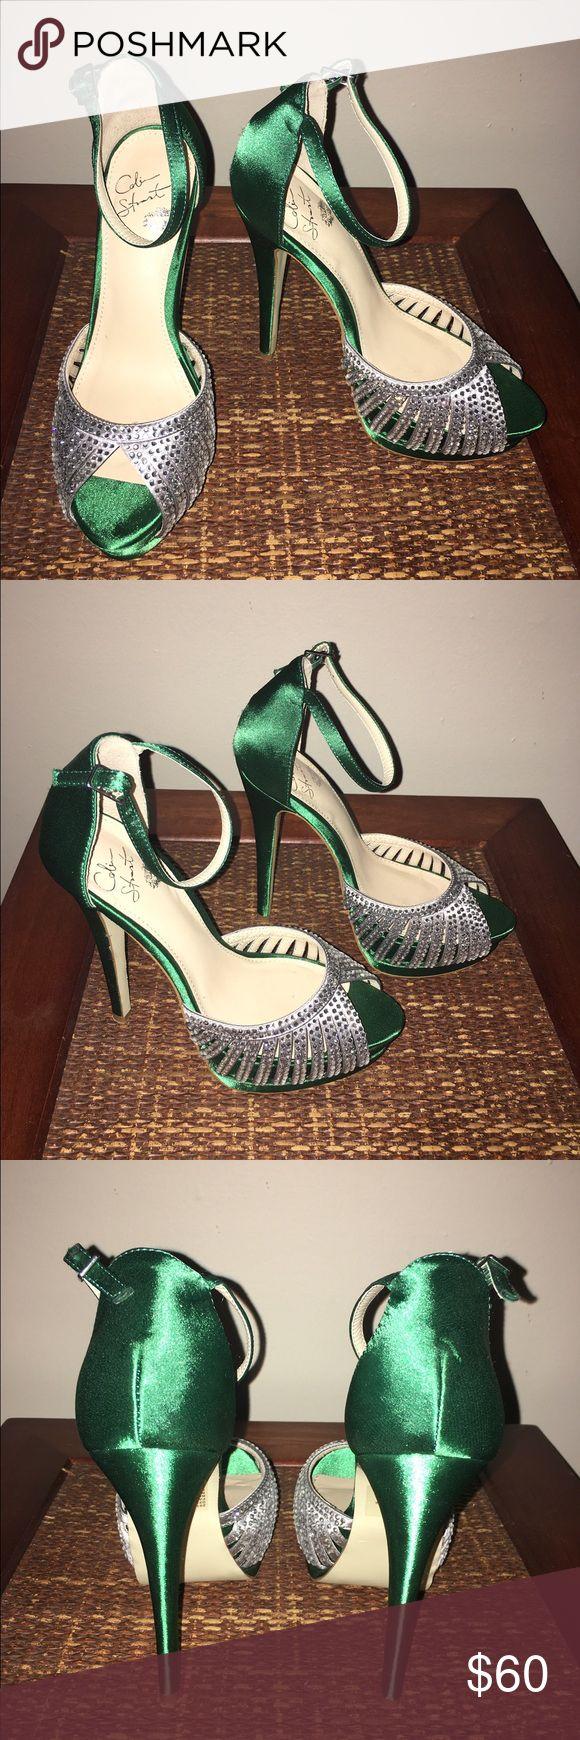 Colin Stuart Heels Rhinestone studded peep toe platform heels **6 inch heel** ** in excellent condition** Colin Stuart Shoes Heels